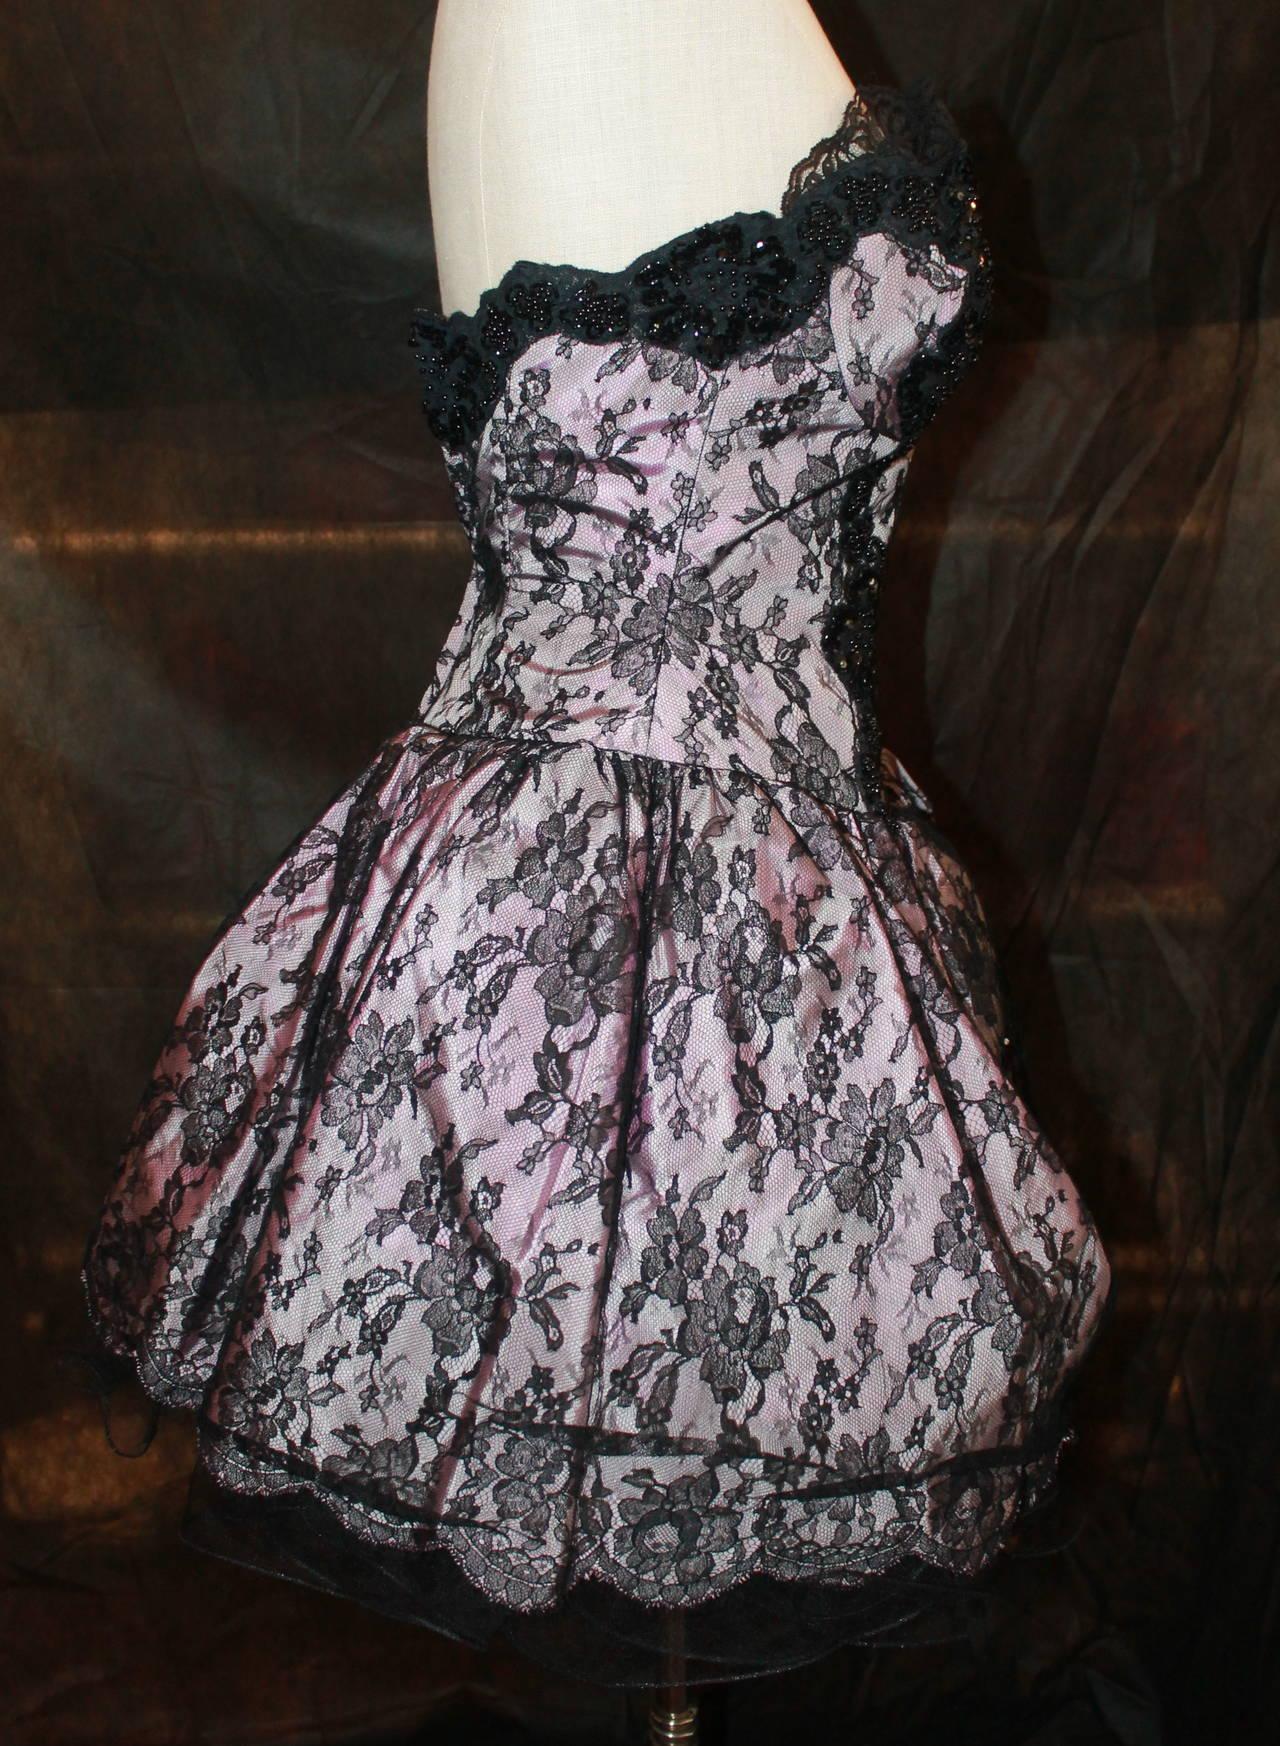 Women's Vicky Tiel 1980s Couture Pale Pink & Black Lace Bodice Dress